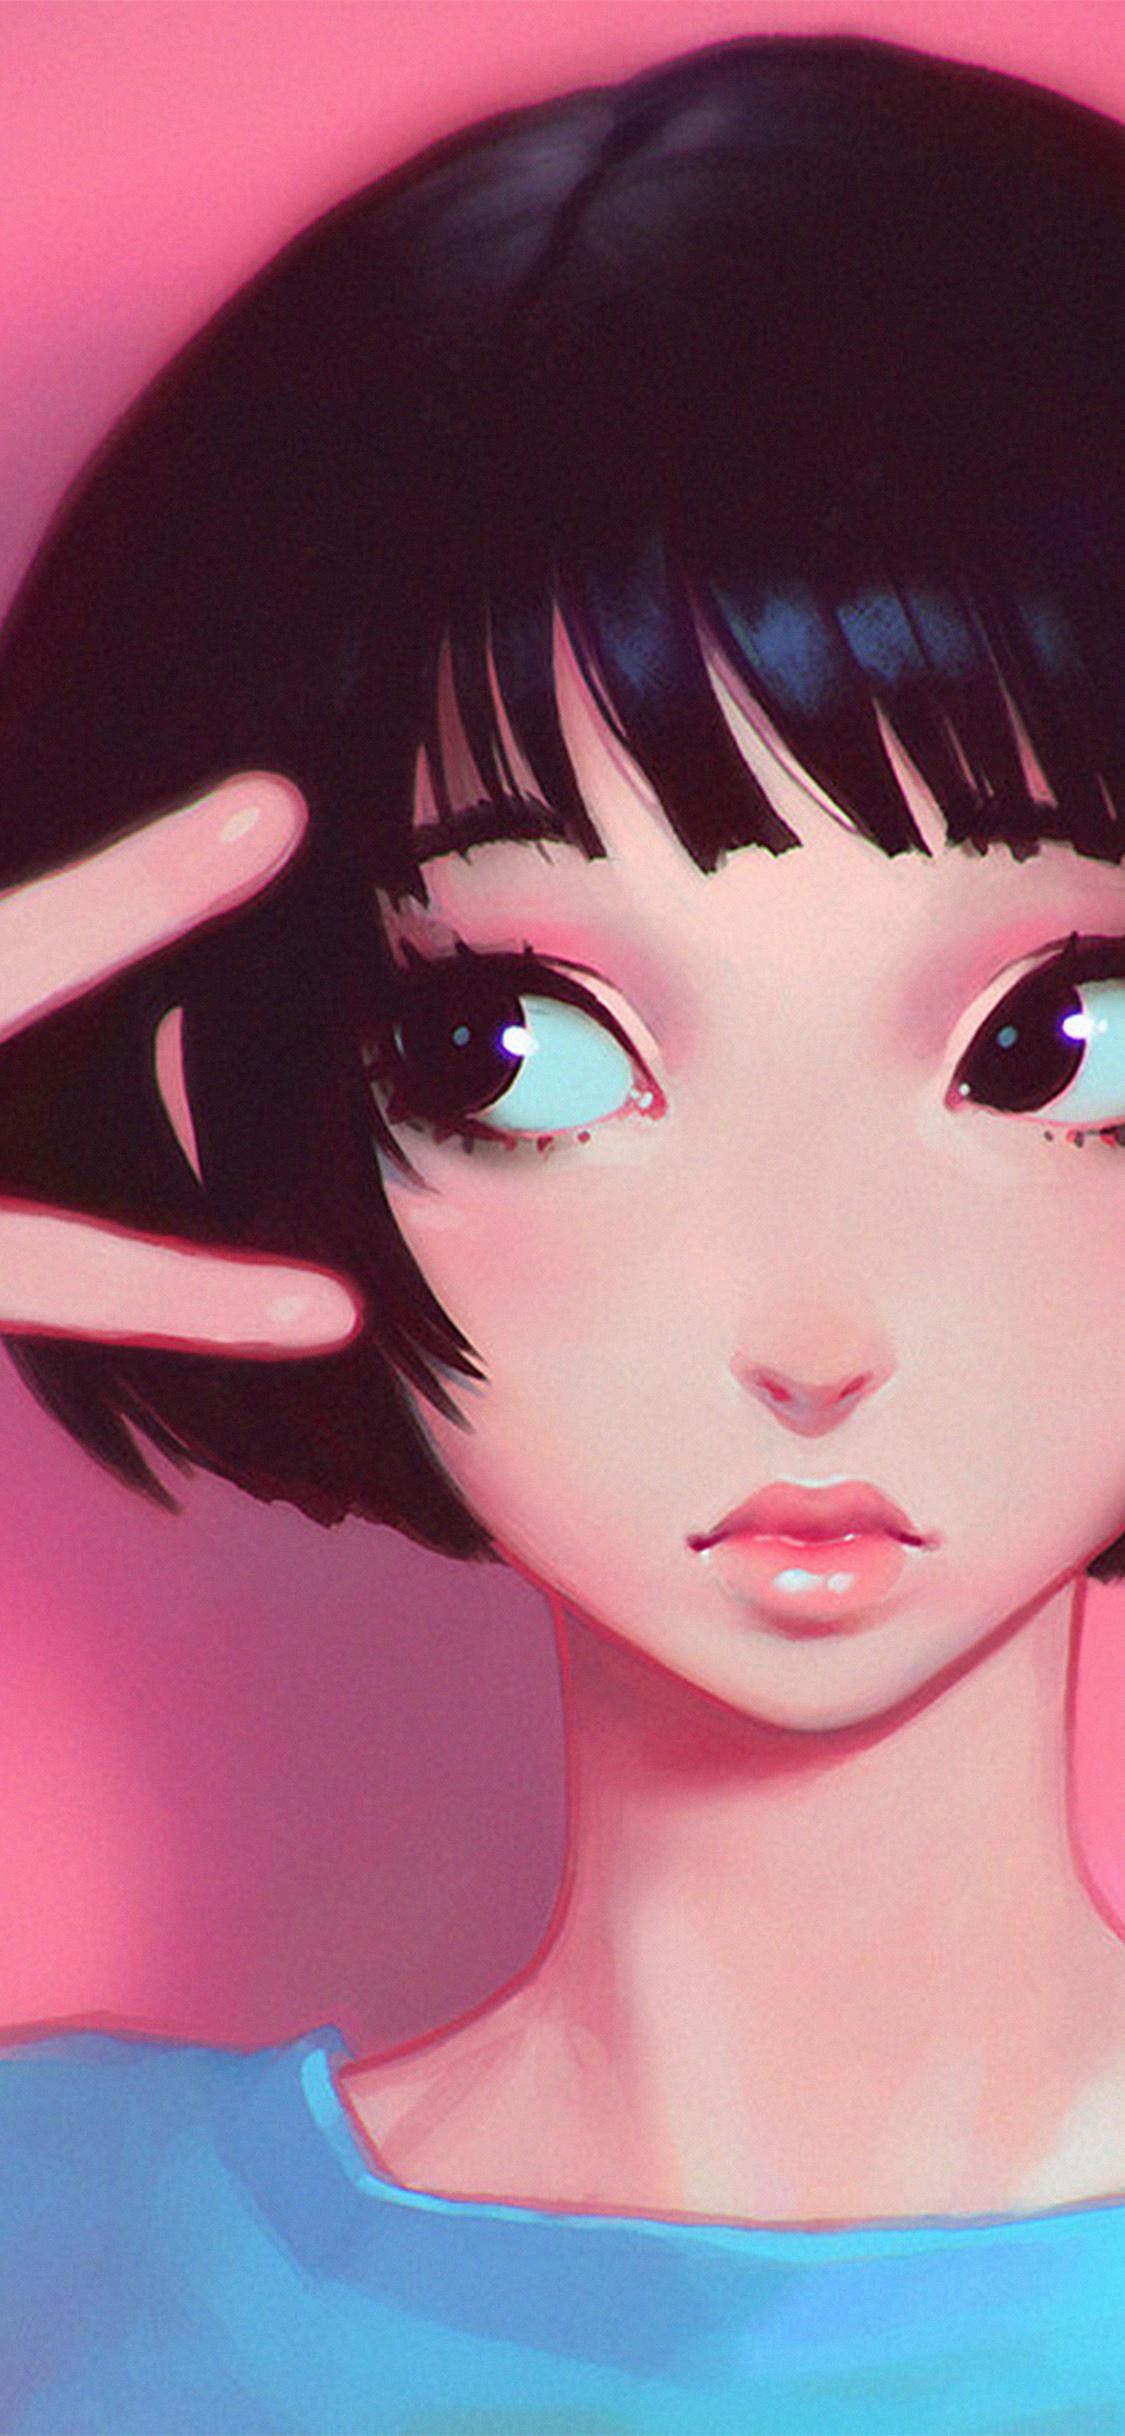 iPhoneXpapers.com-Apple-iPhone-wallpaper-ay03-ilya-kuvshinov-pink-girl-illustration-art